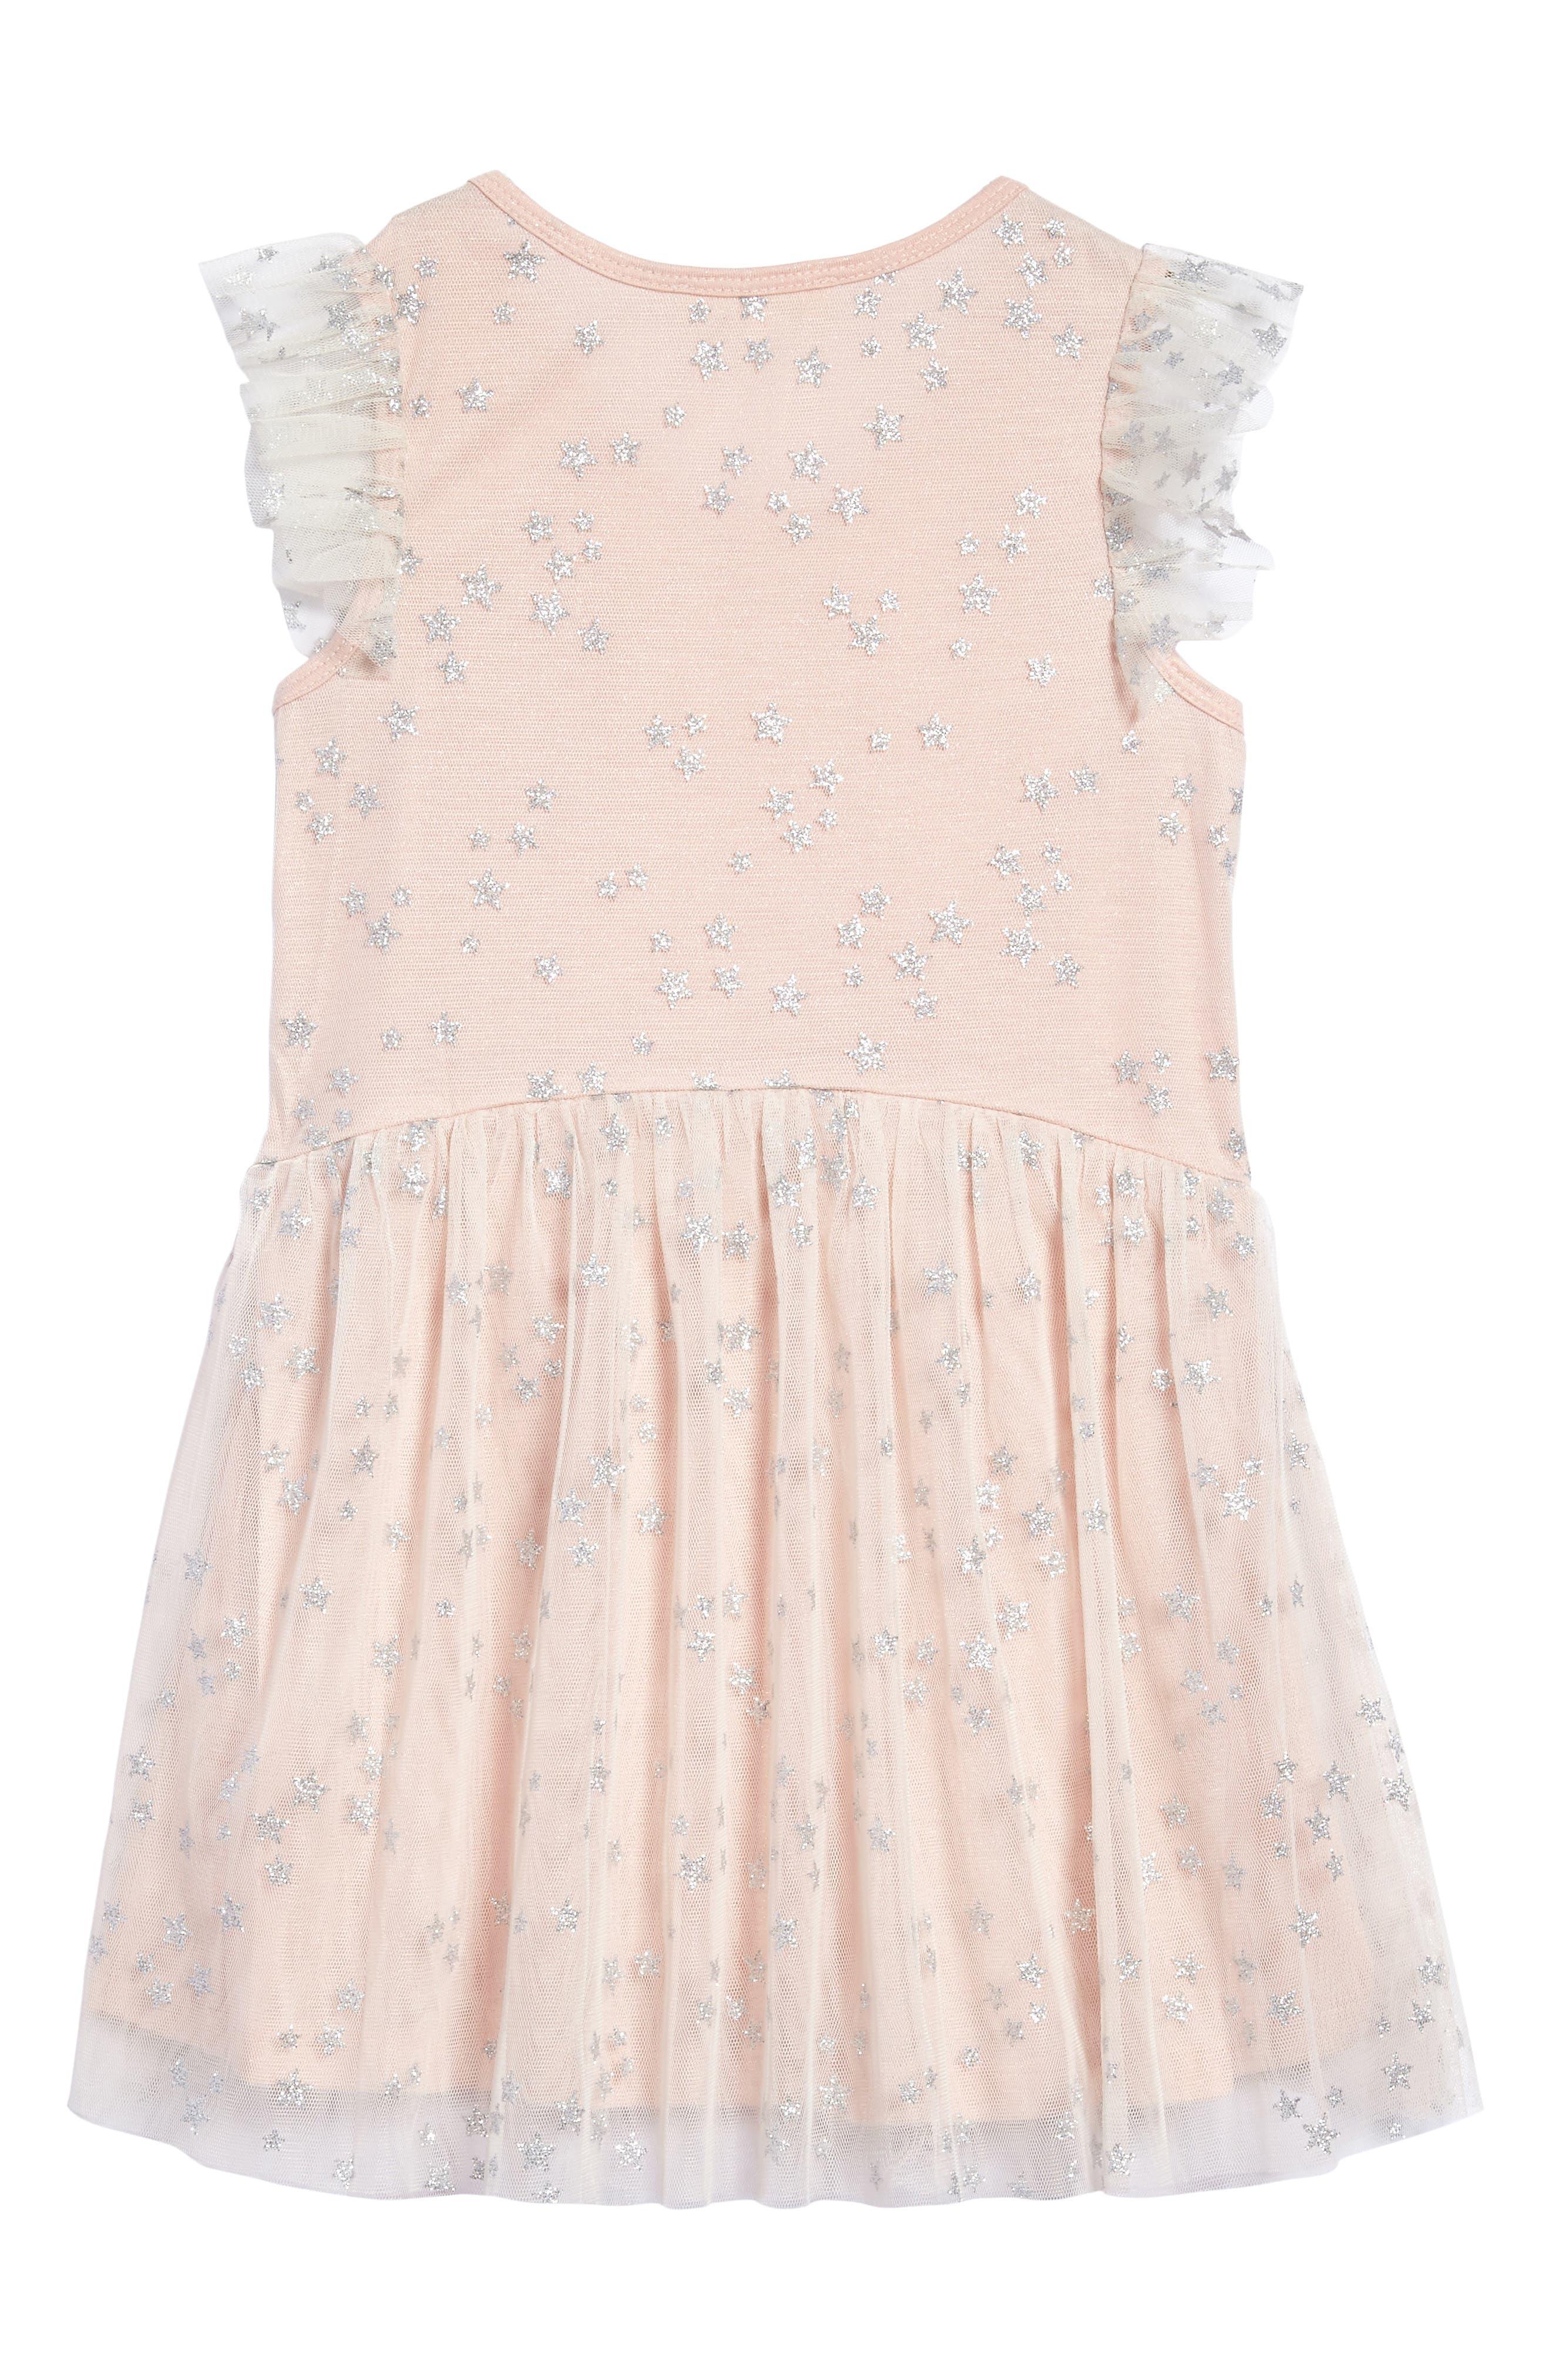 Mesh Star Dress,                             Alternate thumbnail 2, color,                             690